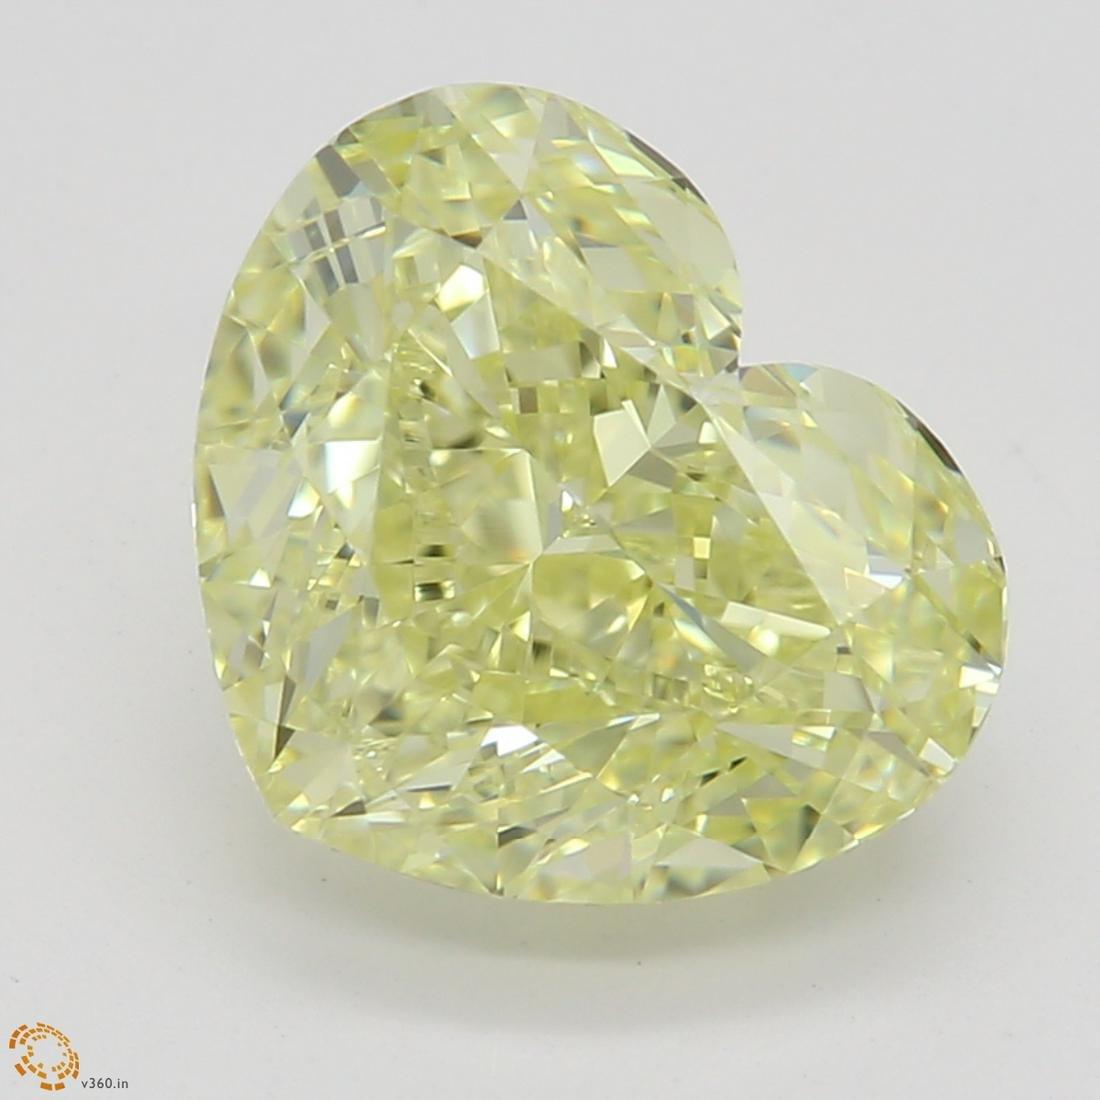 2.37 ct, Yellow/VVS2, Heart cut Diamond